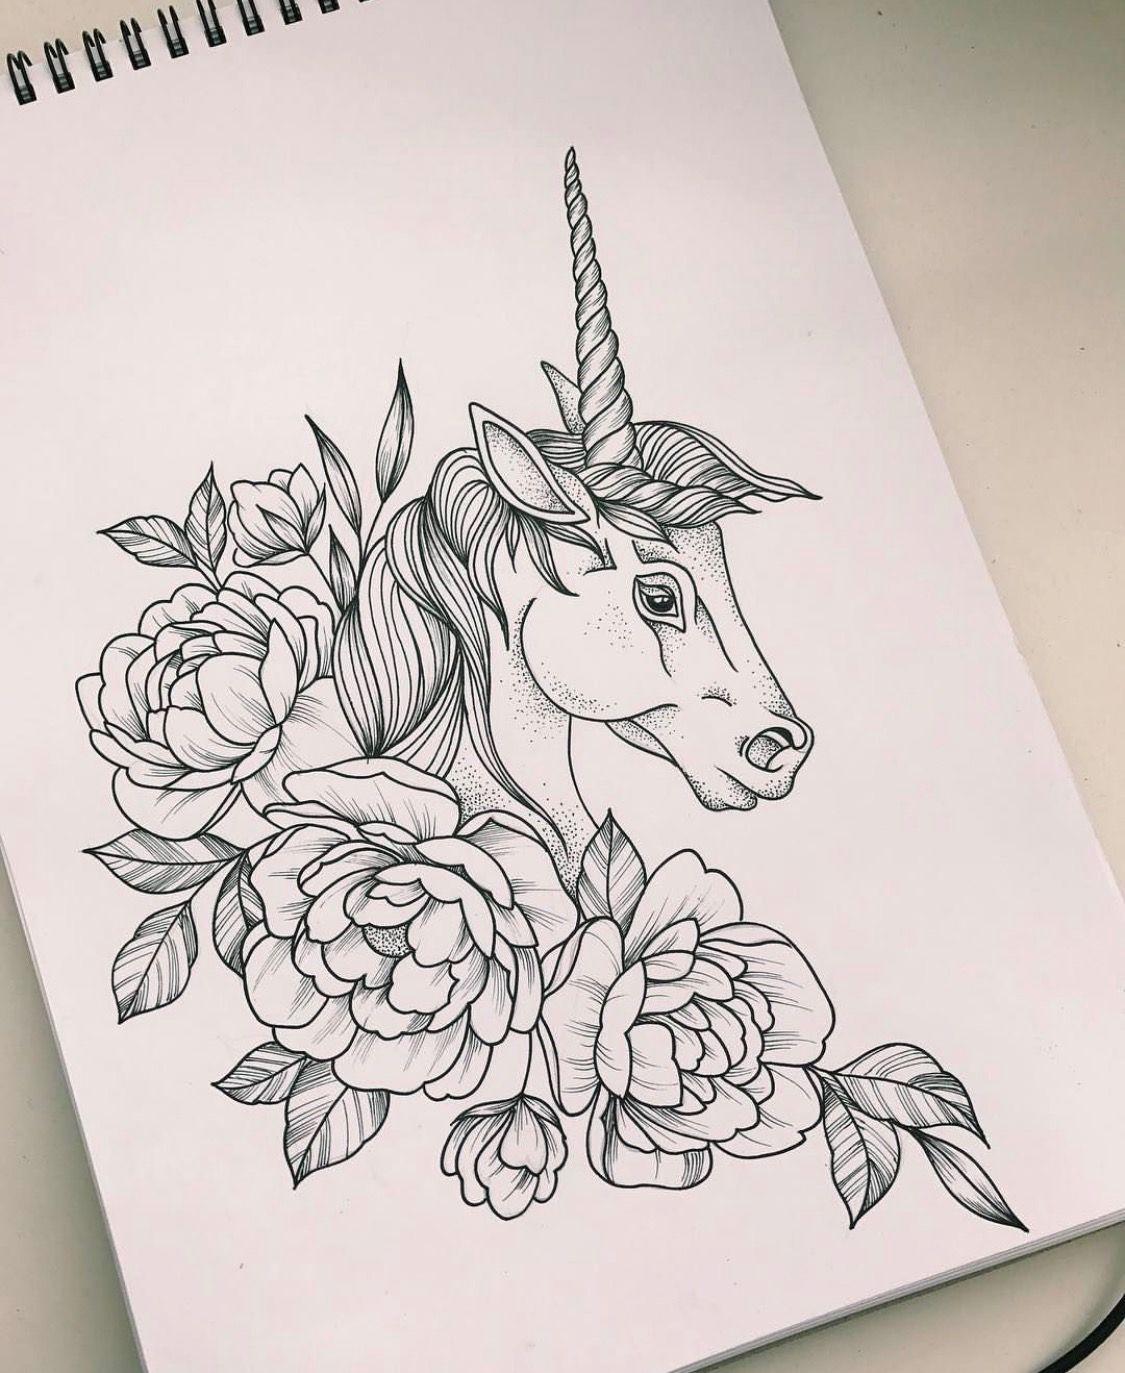 Unicorn Black and White Illustration, Printable Unicorn Digital Download, Unicorn Print, Unicorn Art, Unicorn Gift and Decor, Girls Room